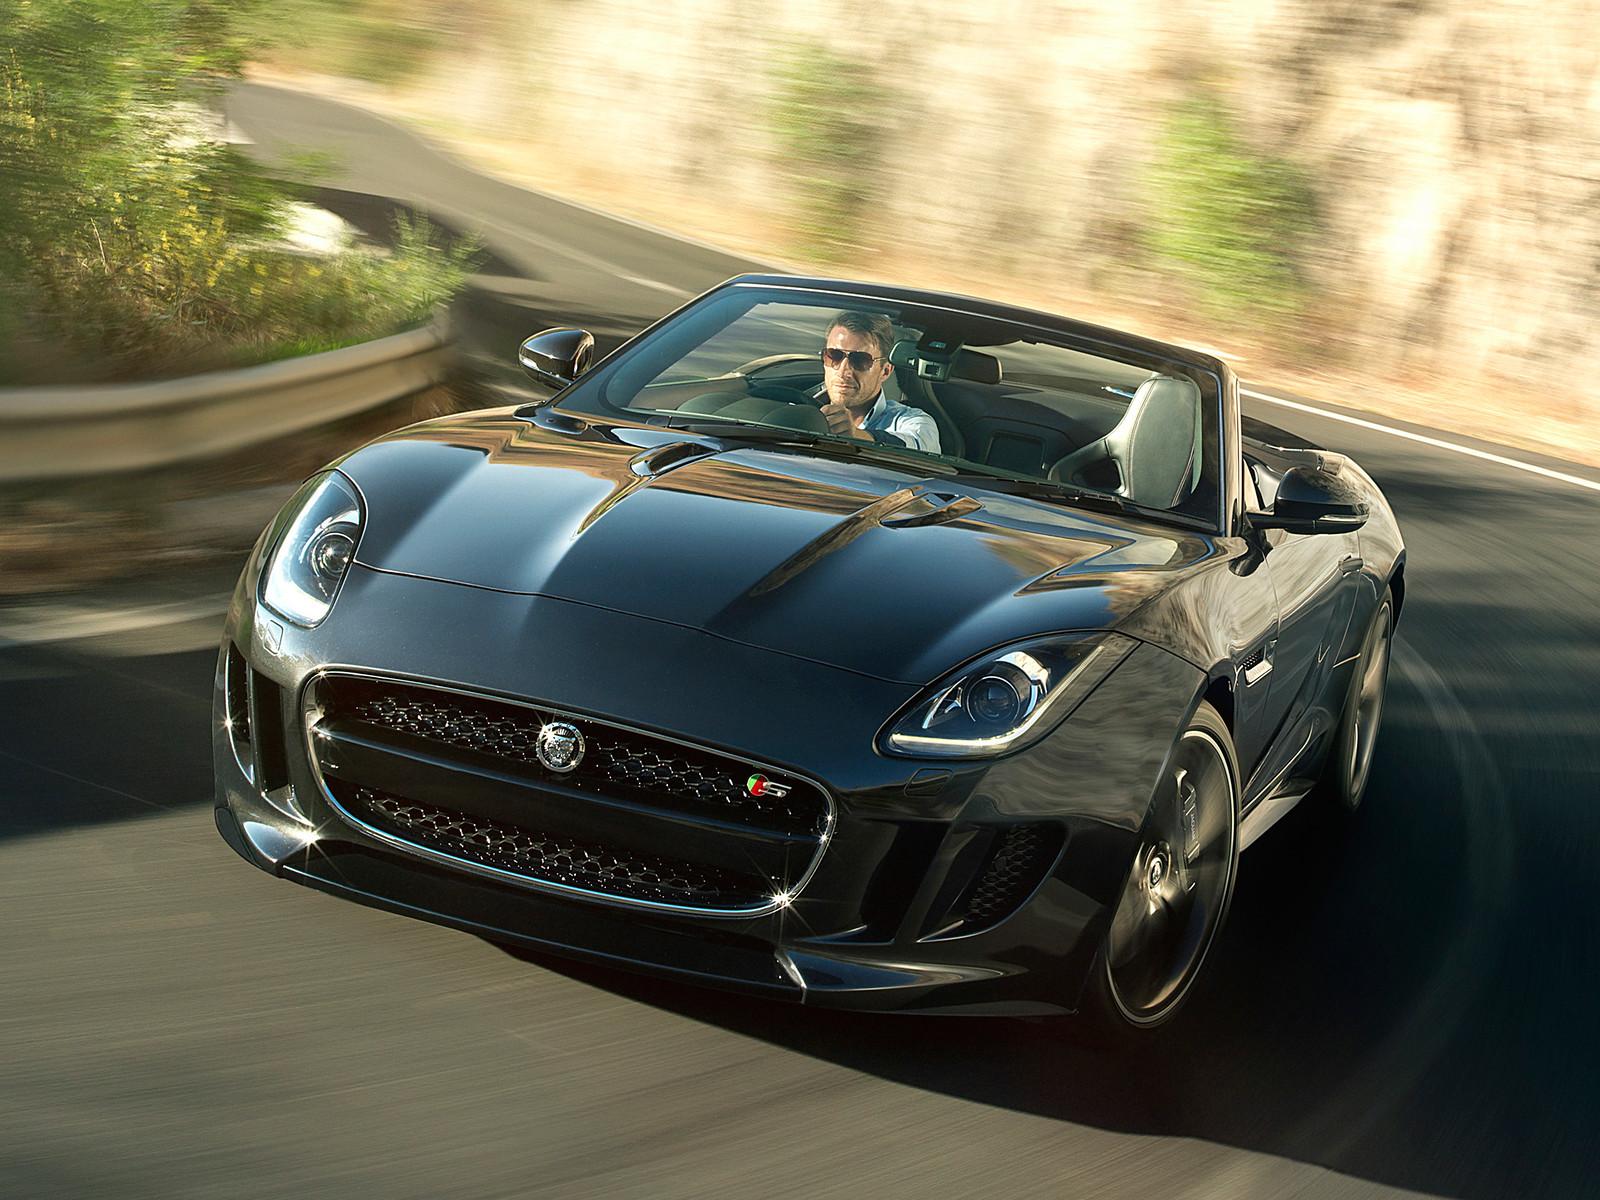 2012 - [Jaguar] F-Type - Page 6 8026259569_4cee24633b_h